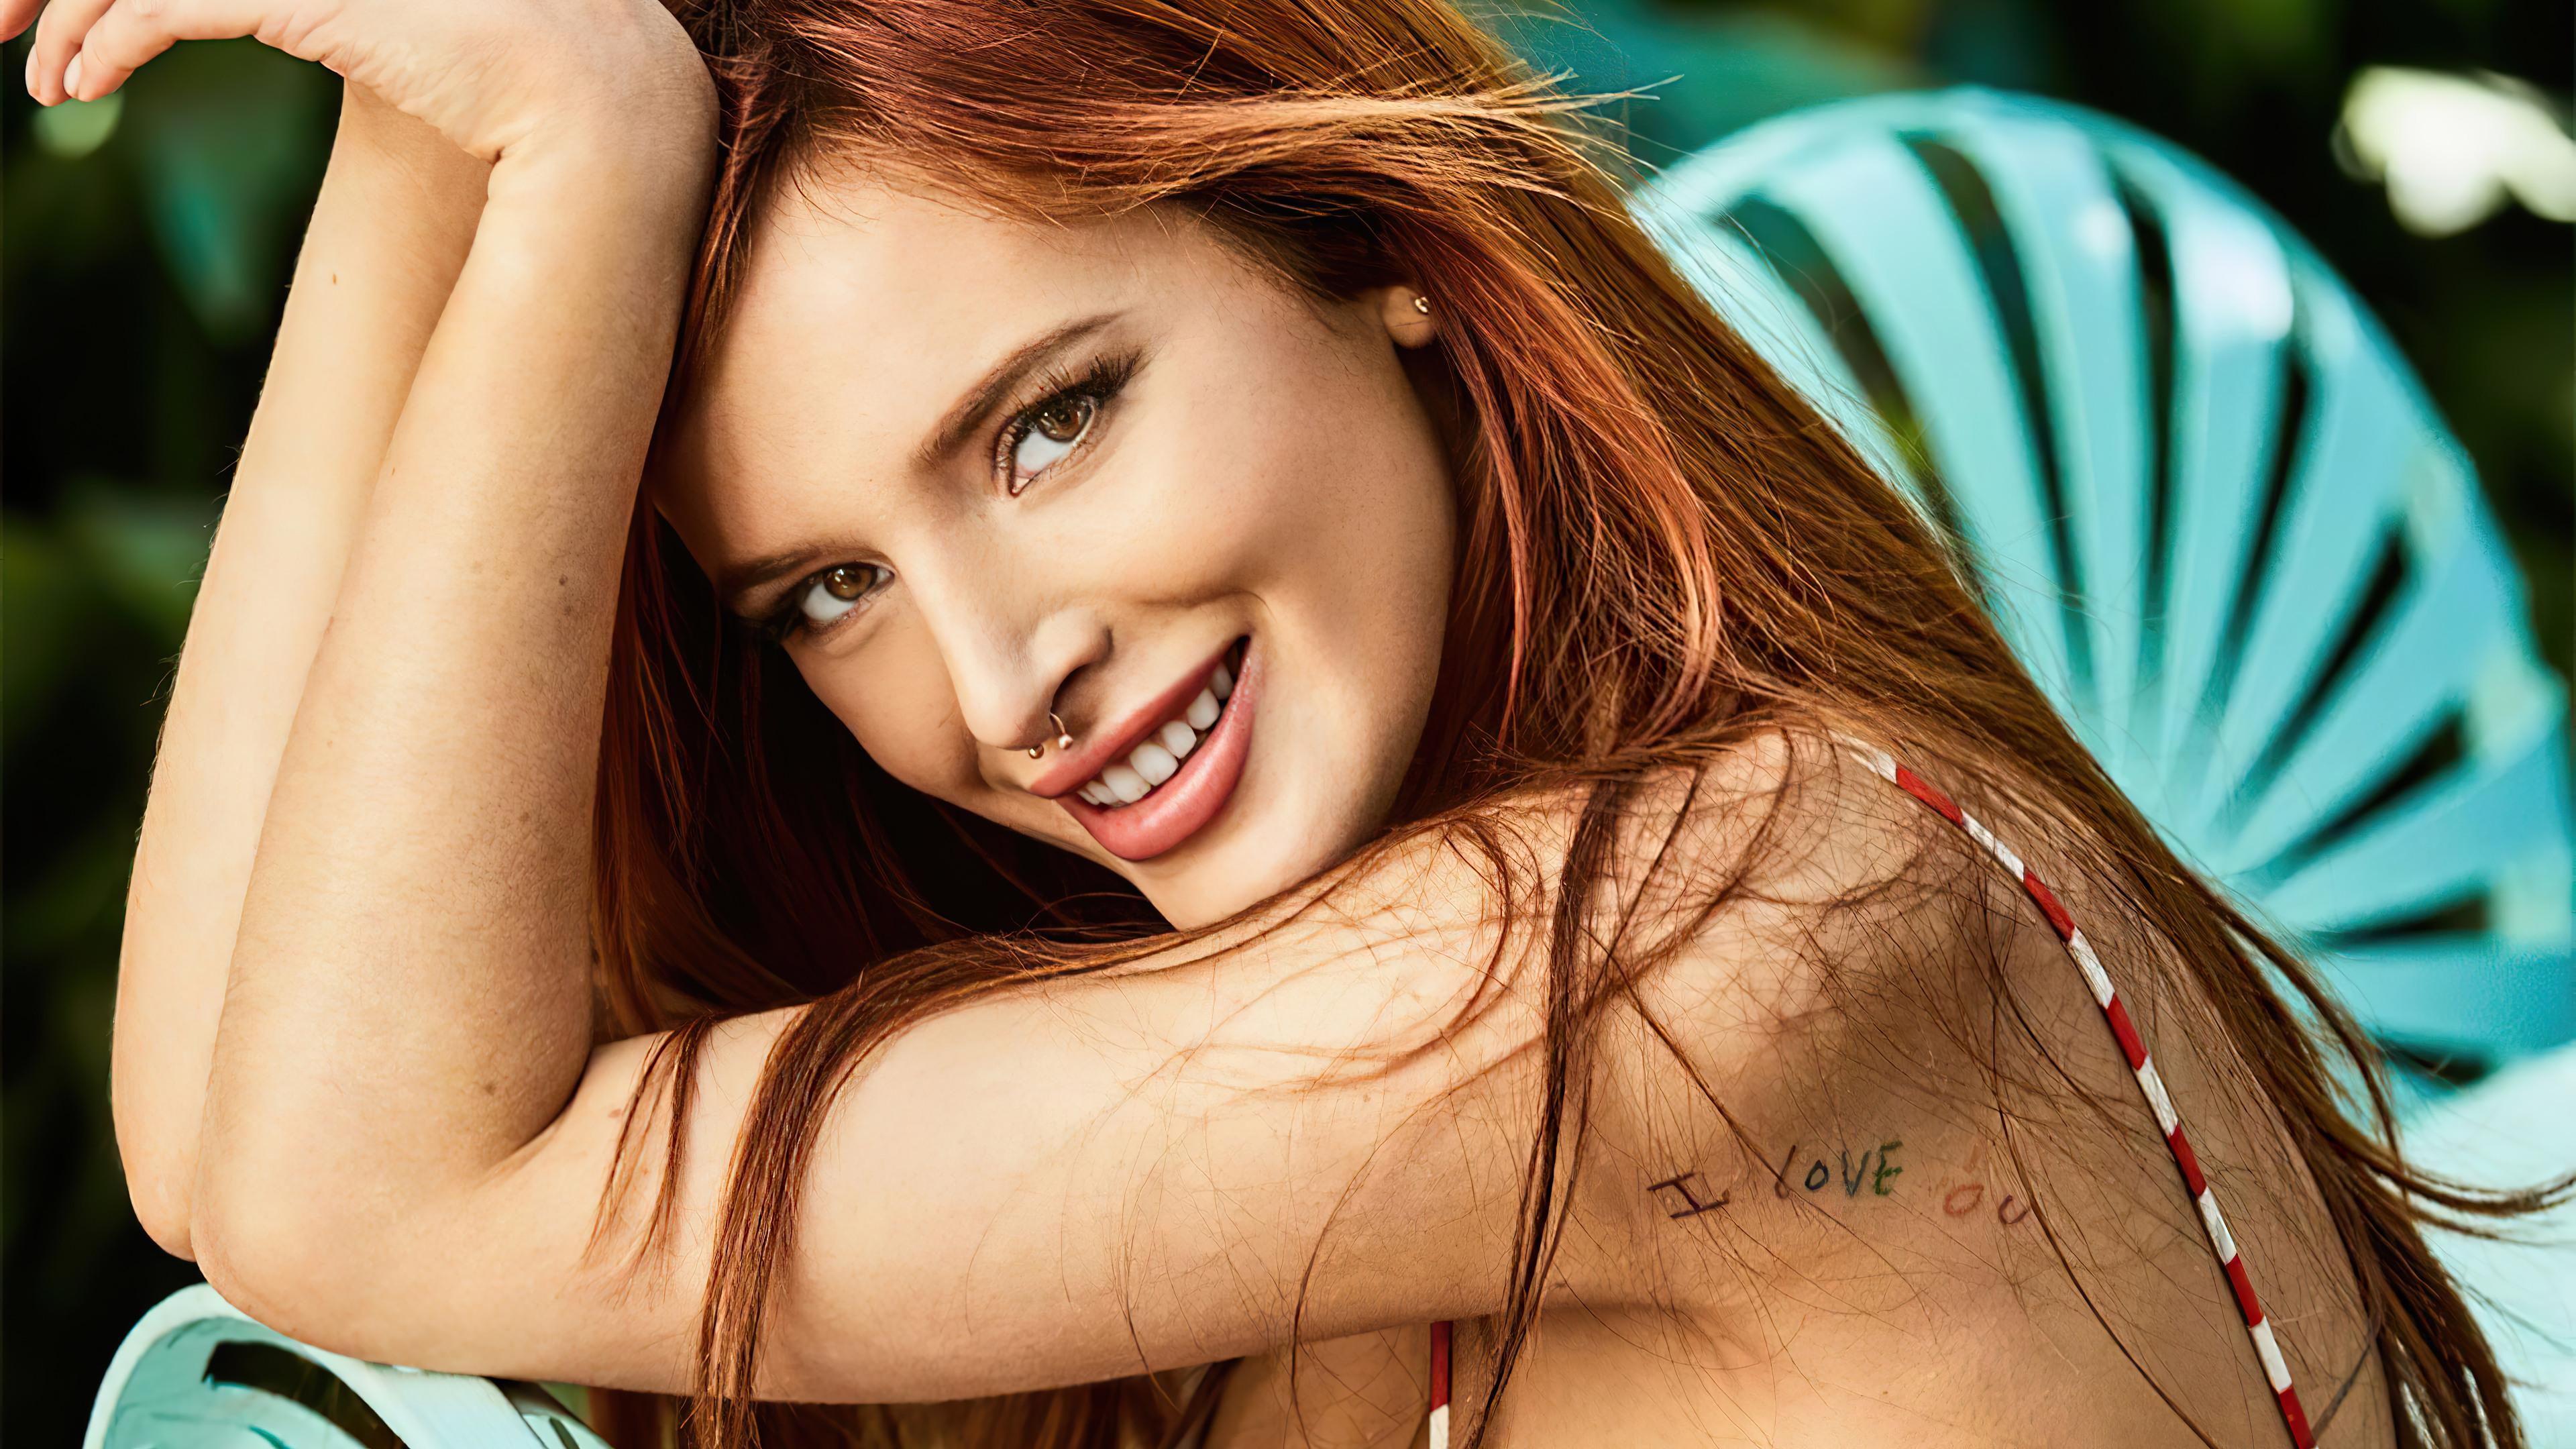 Fondos de pantalla Bella Thorne sonriendo